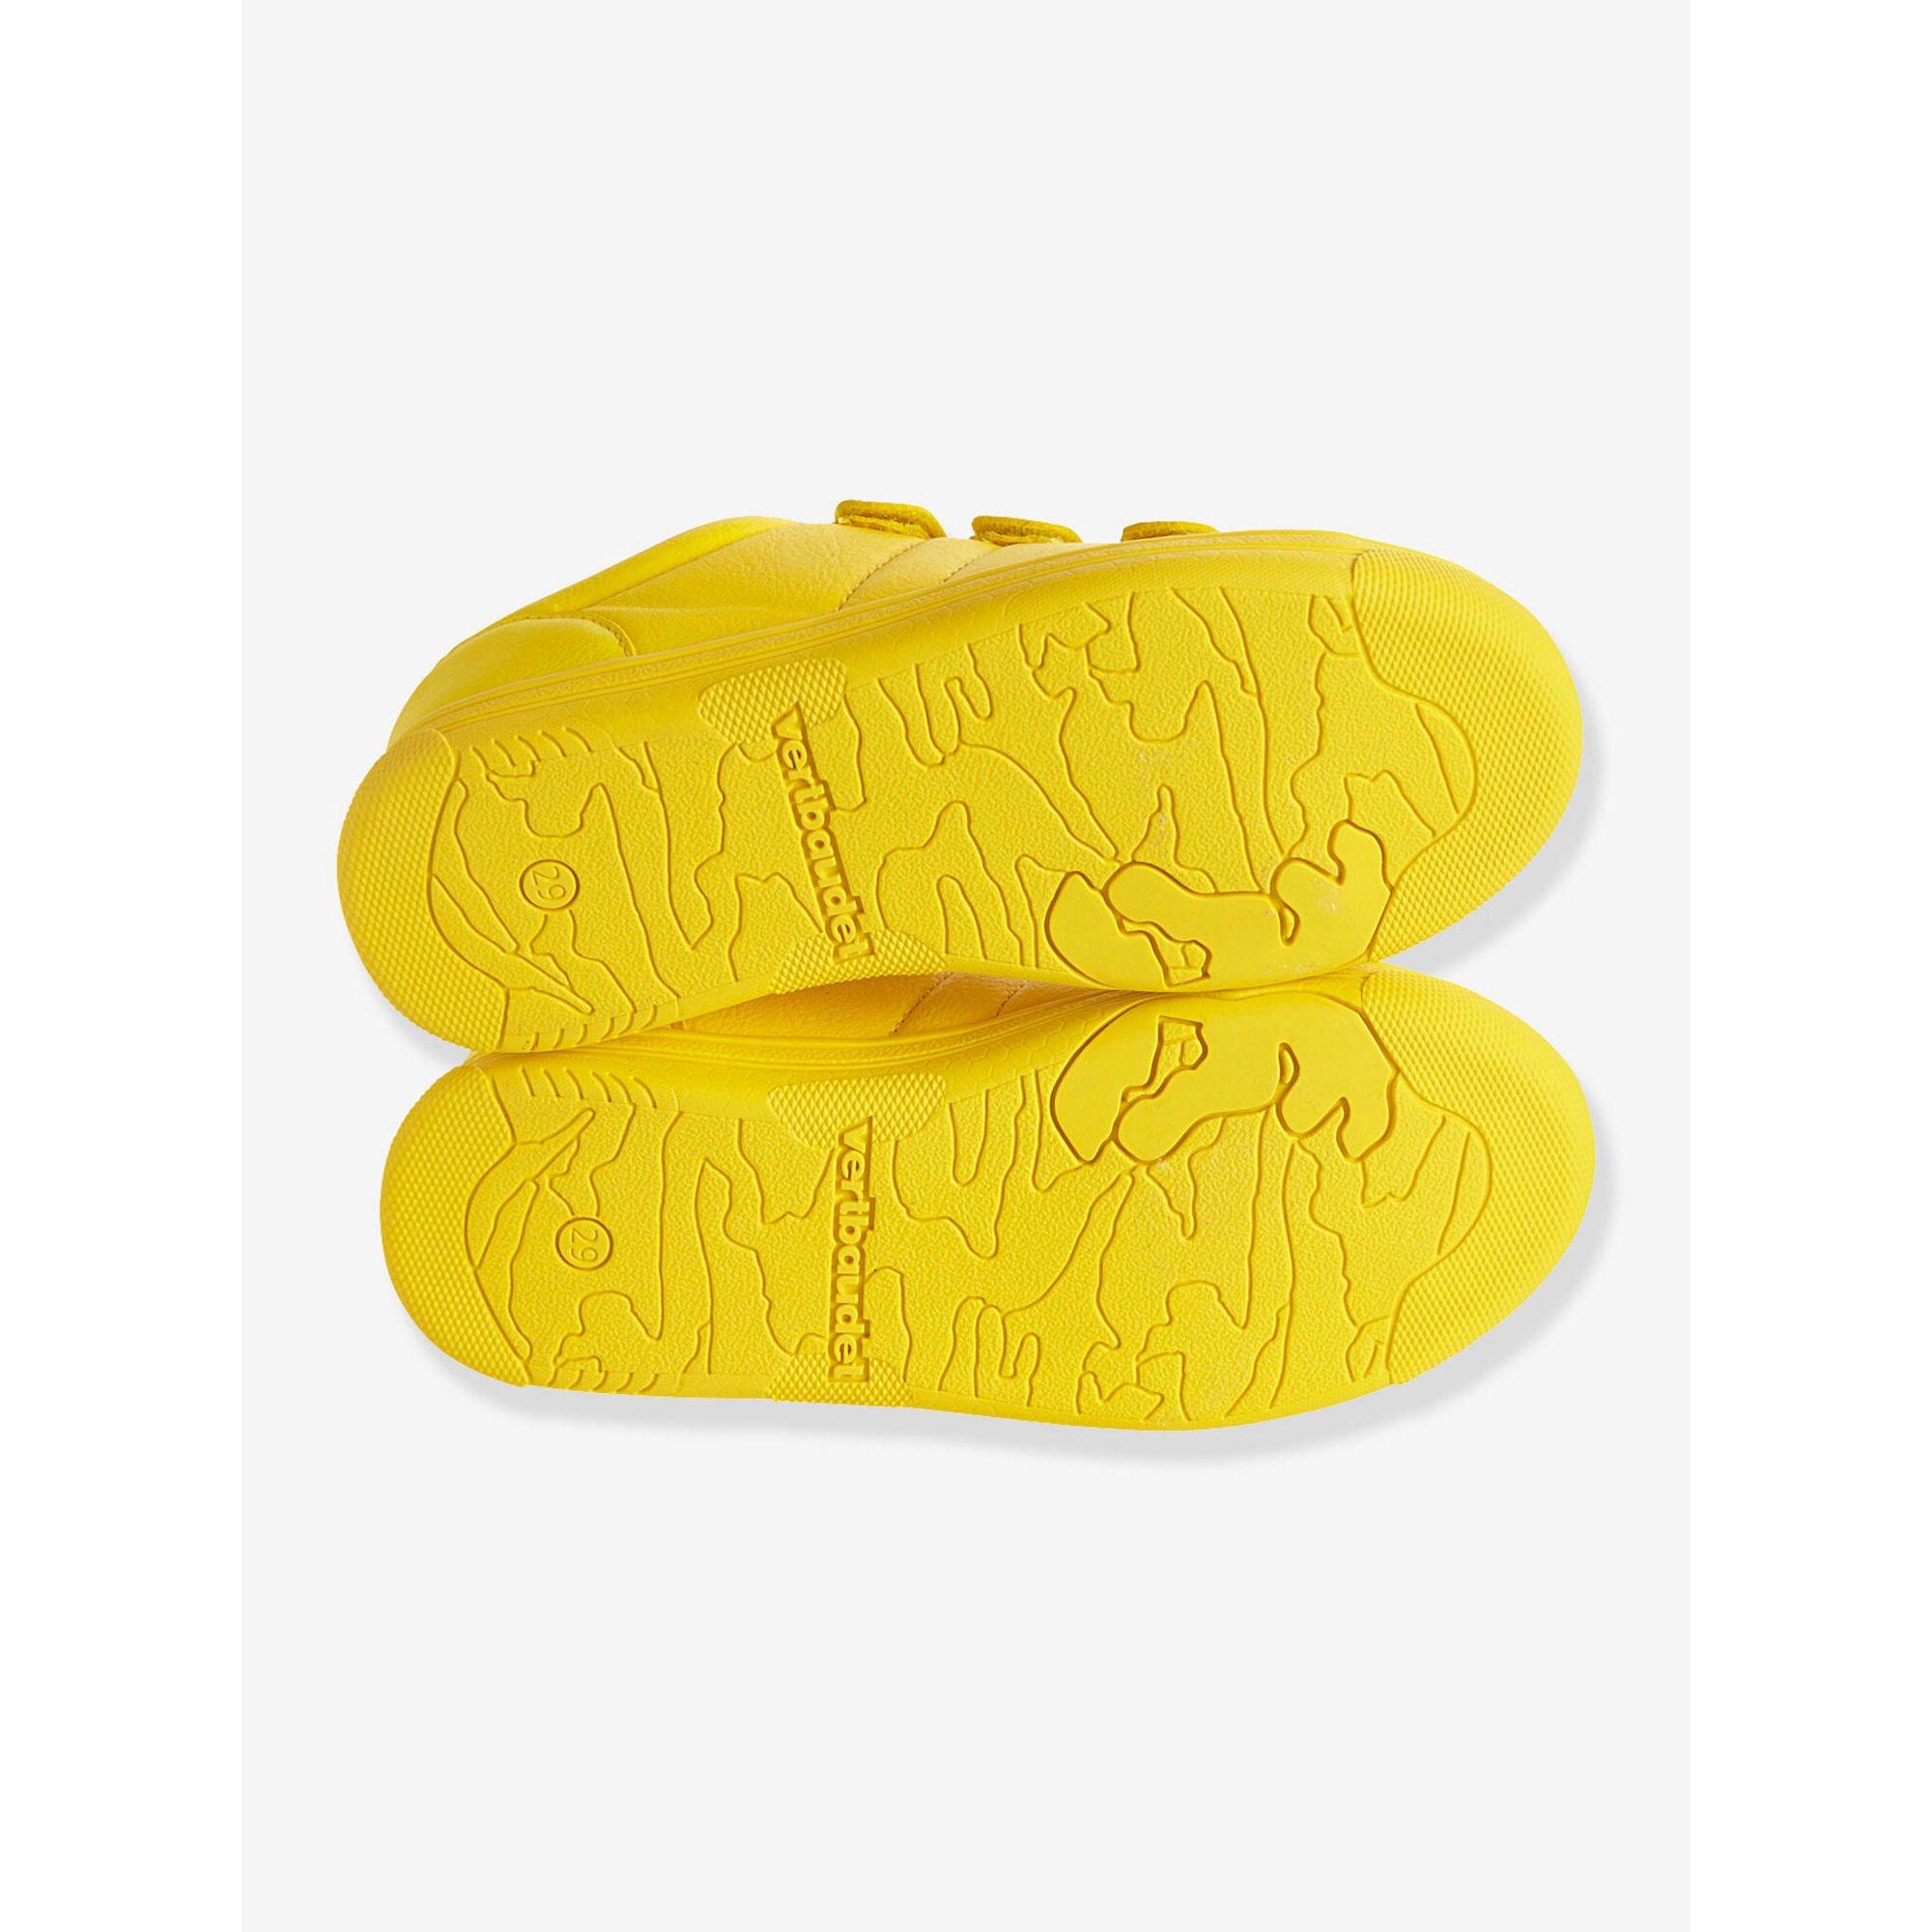 vertbaudet-sneakers-mit-klettverschluss